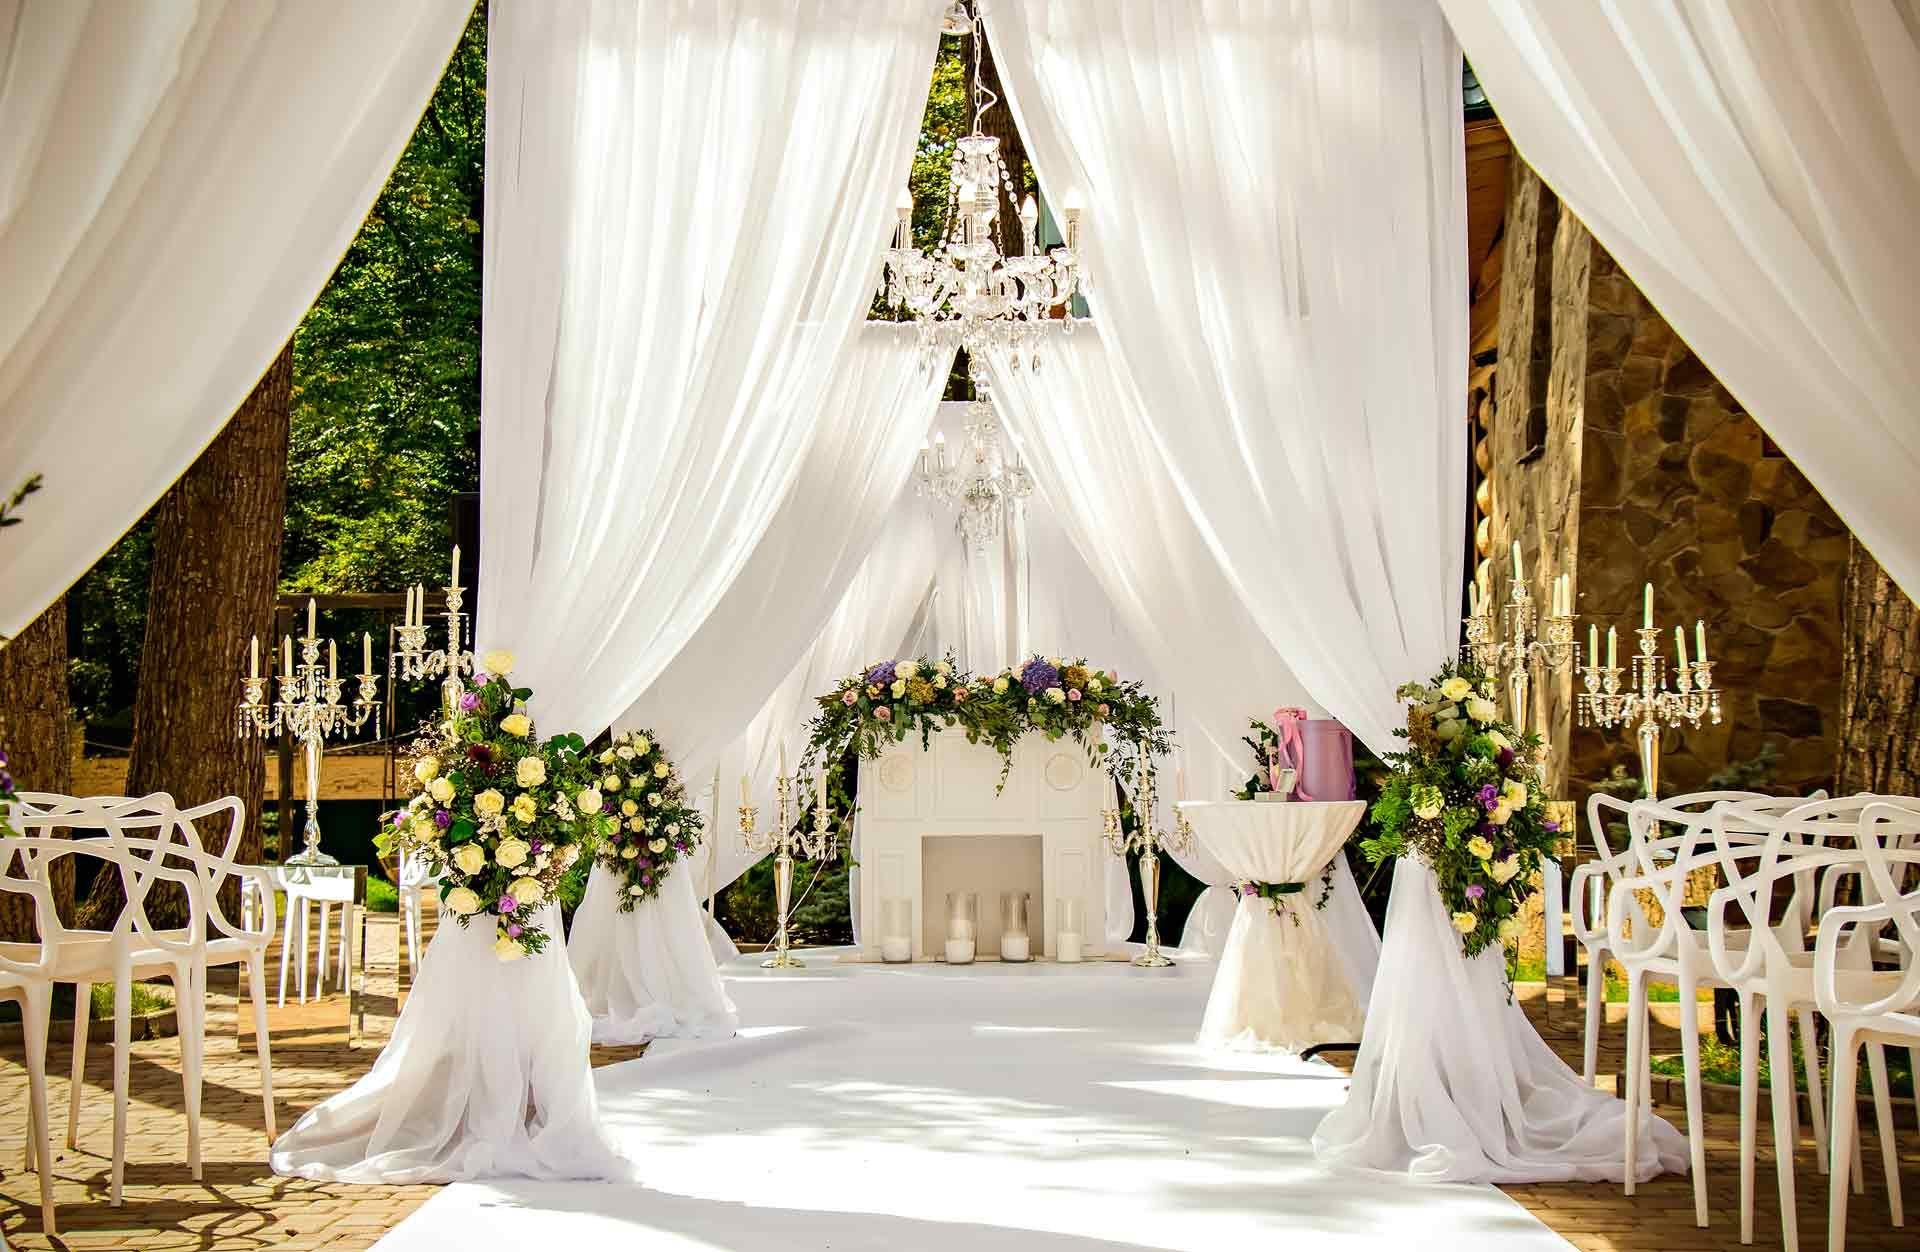 Maximalism Wedding Style Is The Exact Opposite Of Minimalism